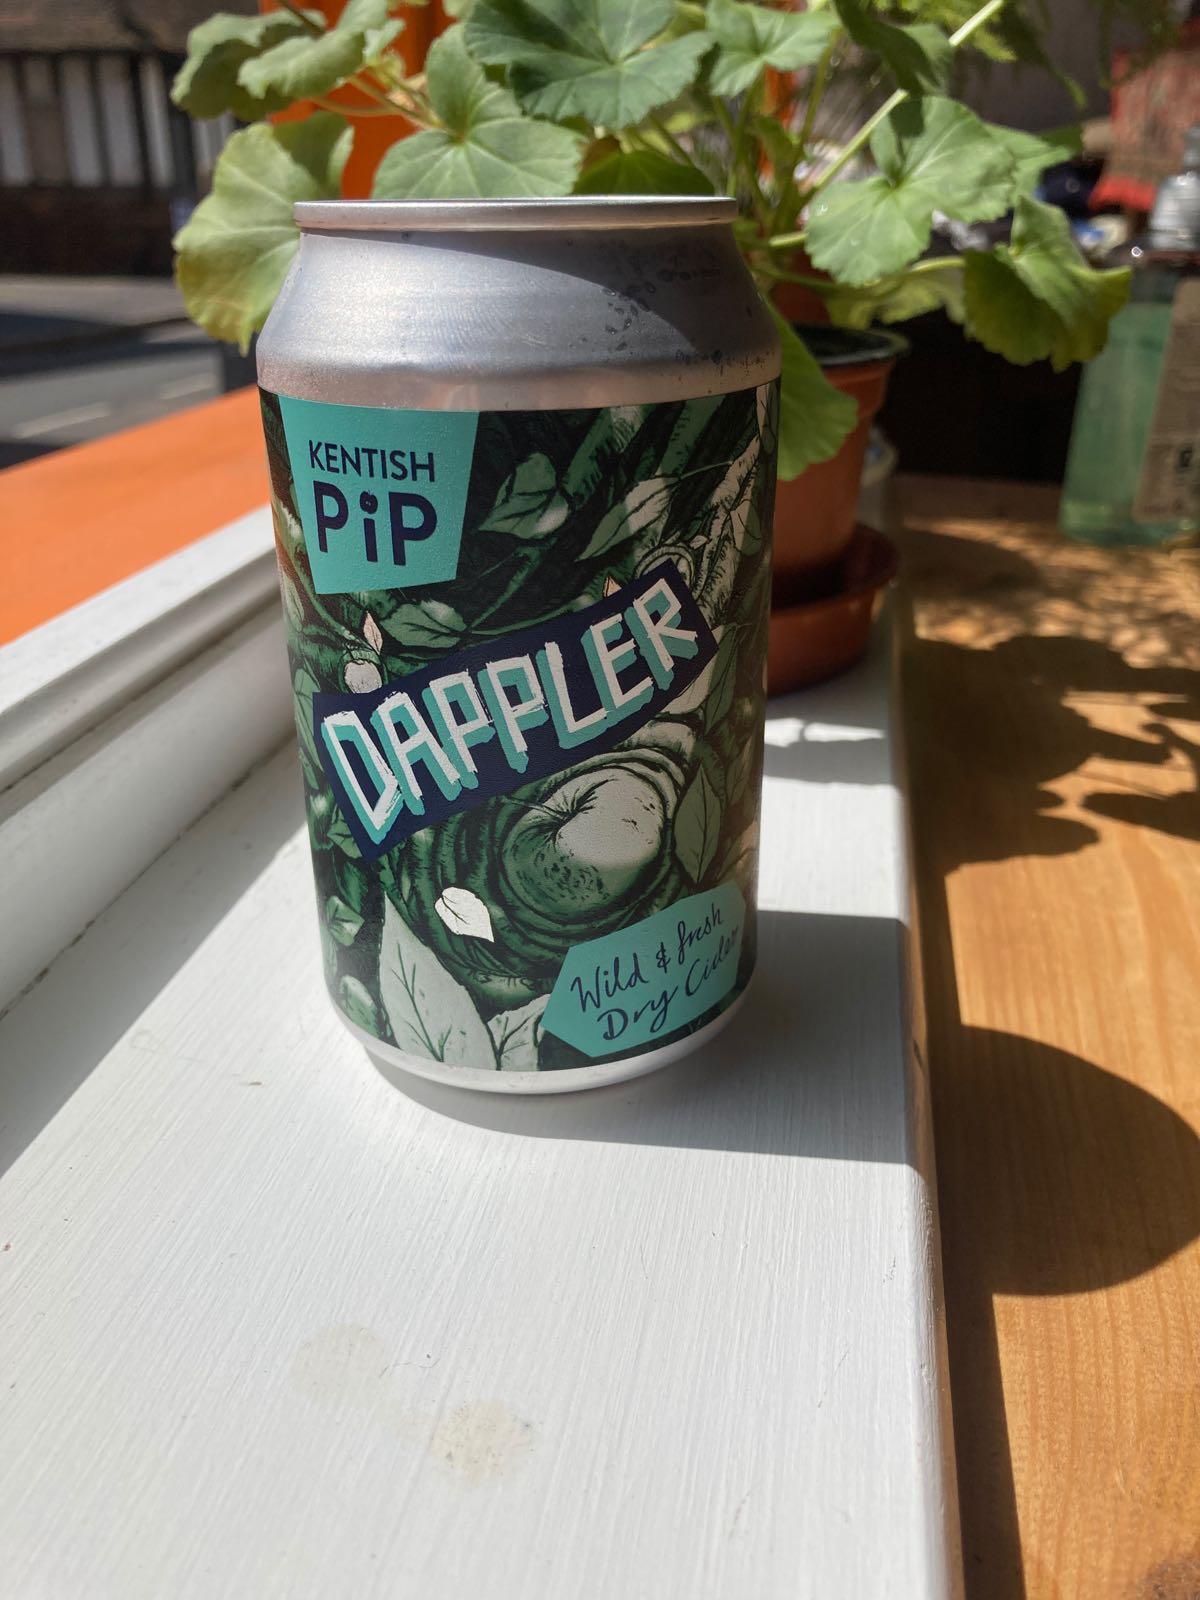 Kentish Pip - Dappler (5.5% Dry Cider)